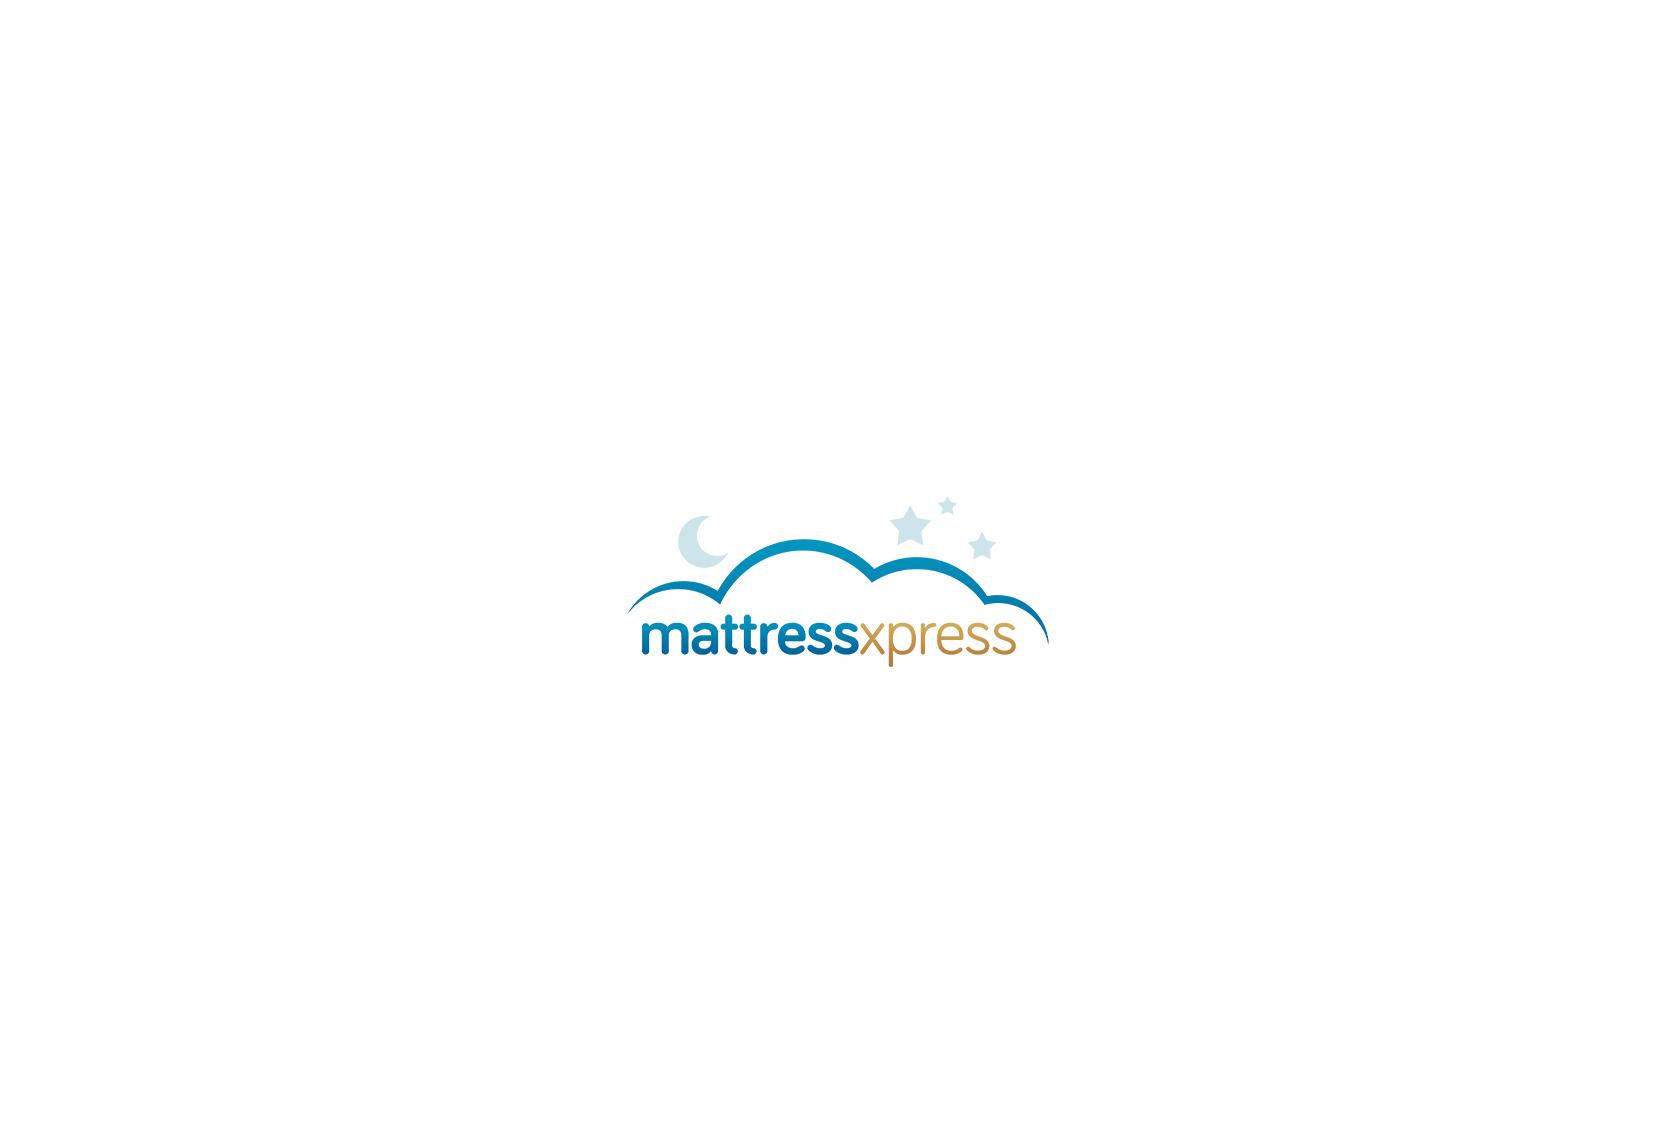 Mattress Xpress Logo Dark - Mattress Xpress - Creative Digital